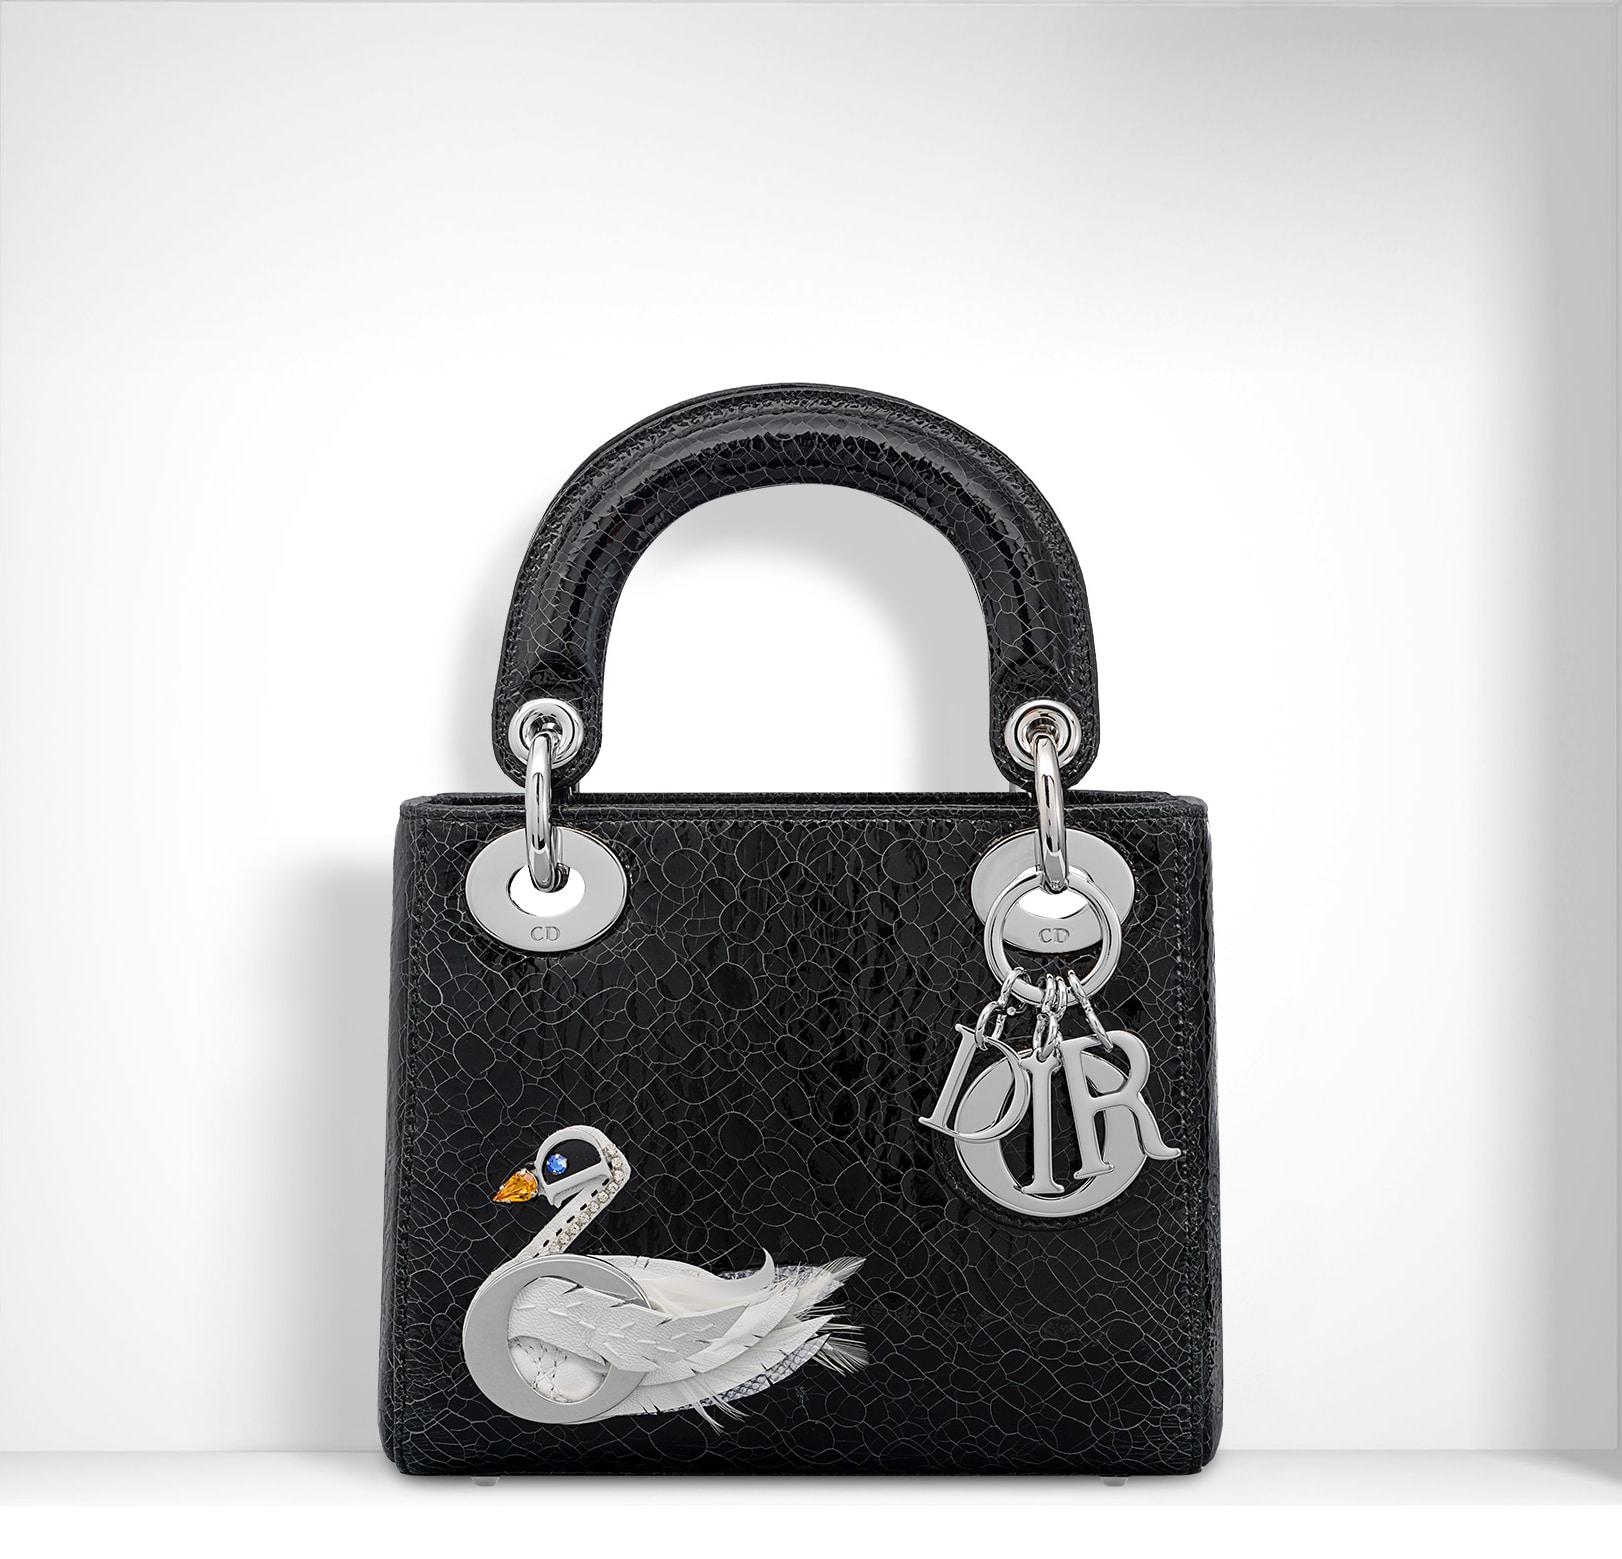 lady dior bag price - photo #17